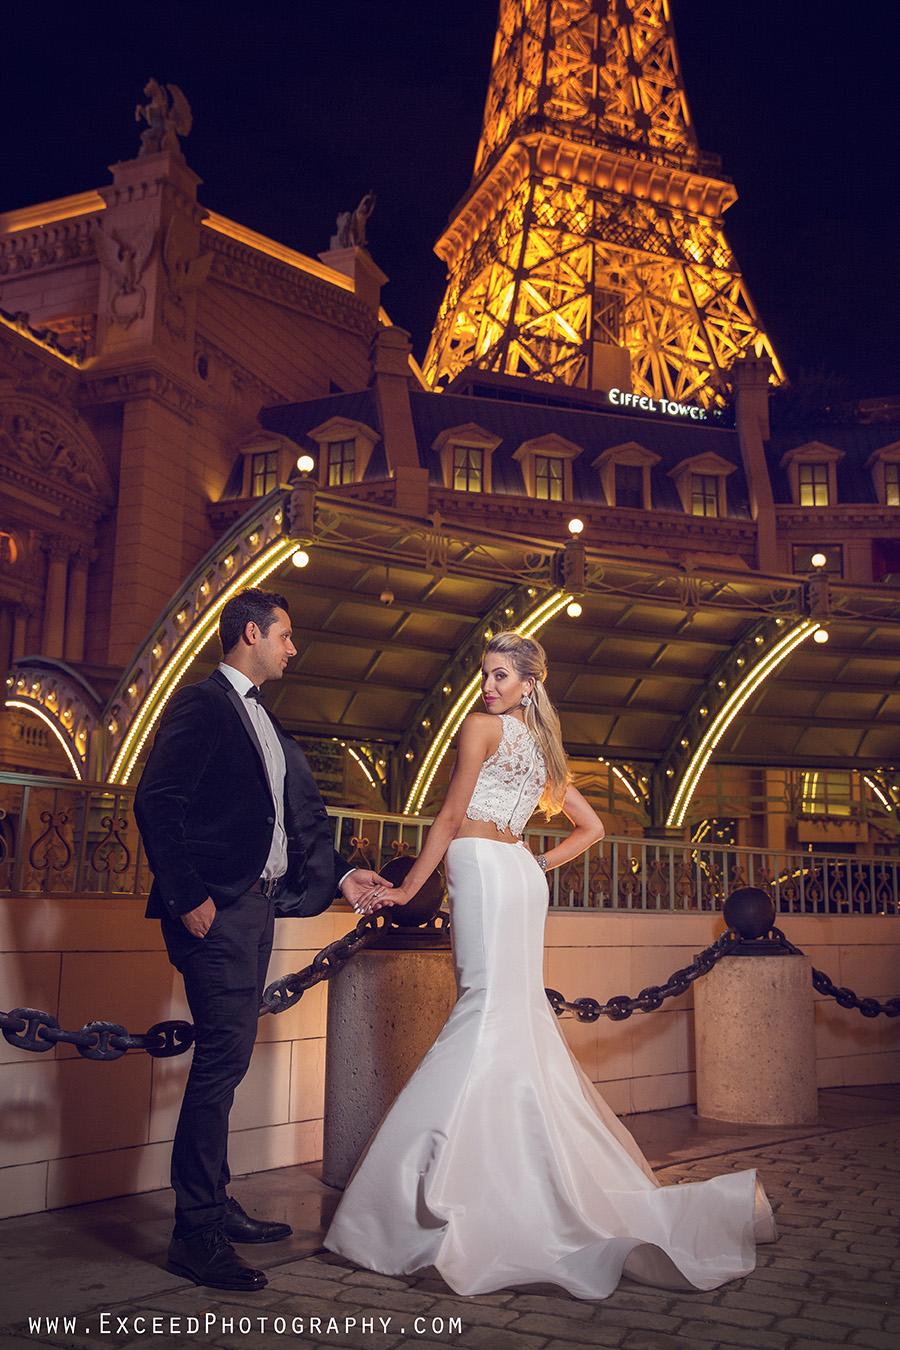 Paris Hotel Las Vegas Weddings 2018 World S Best Hotels